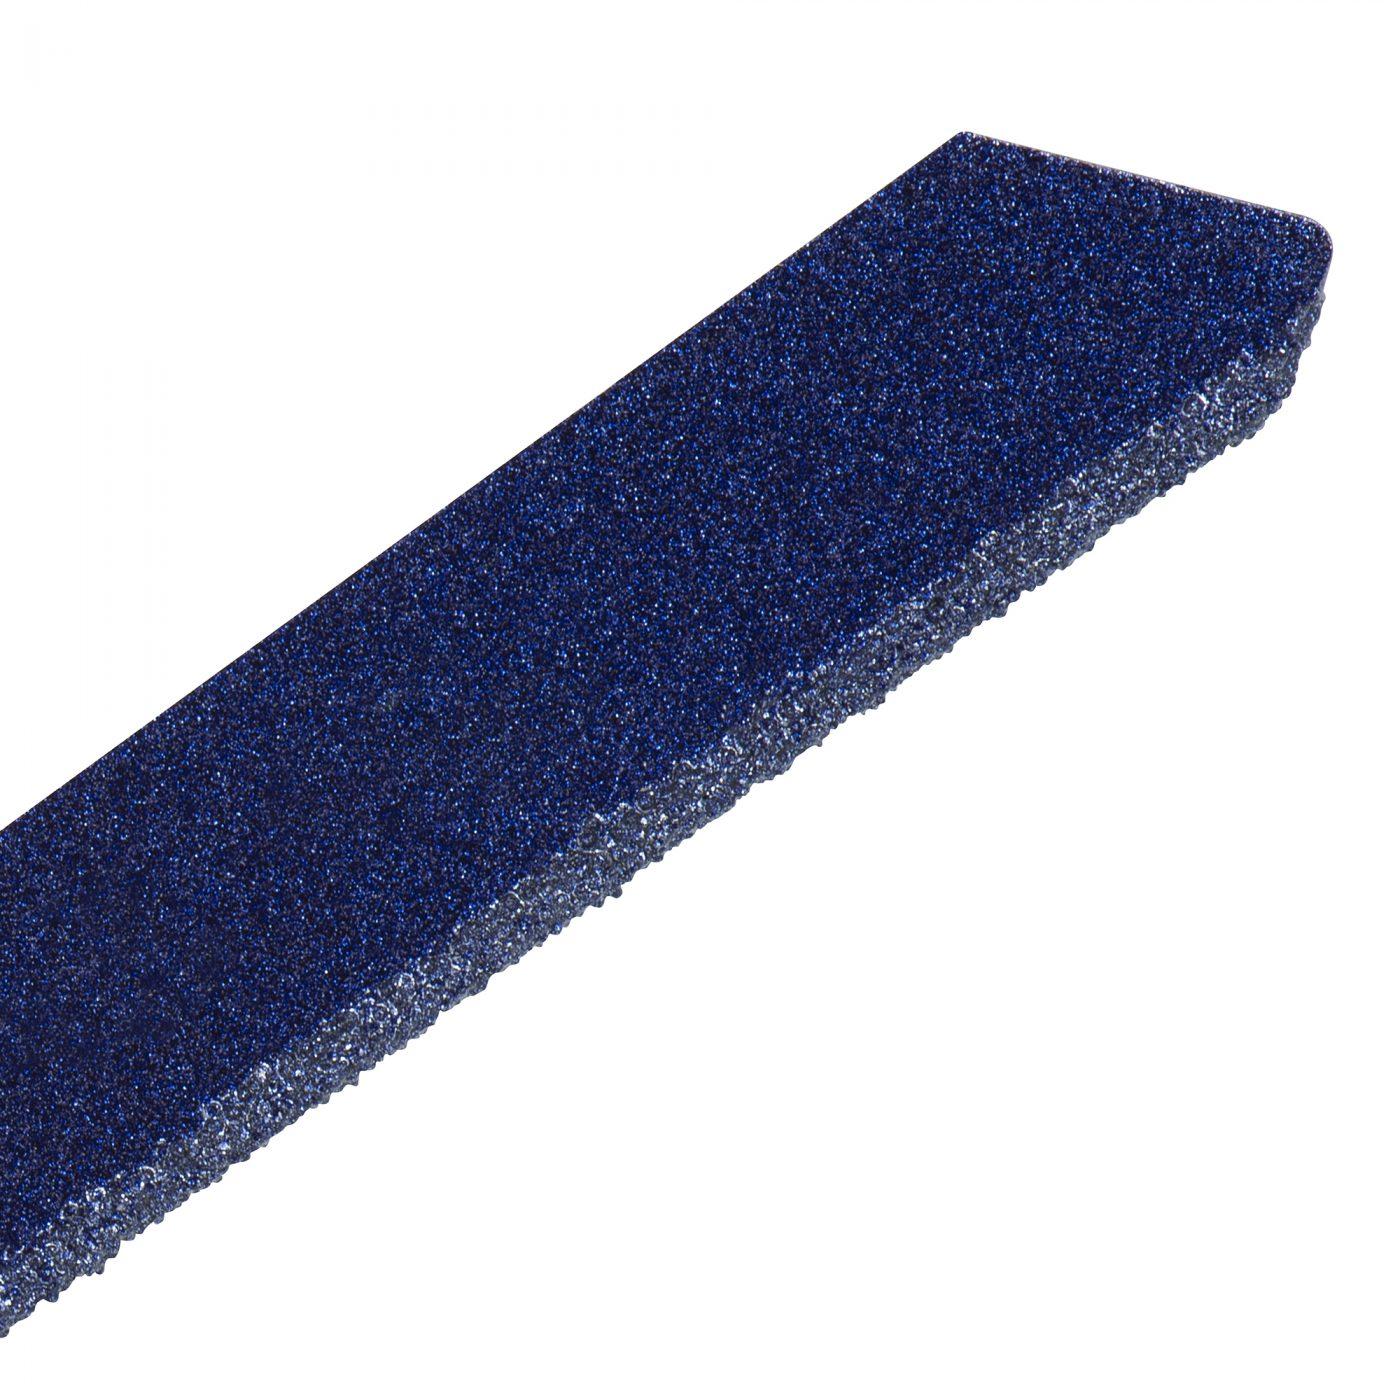 "3"" PRO Diamond Jigsaw Blade"